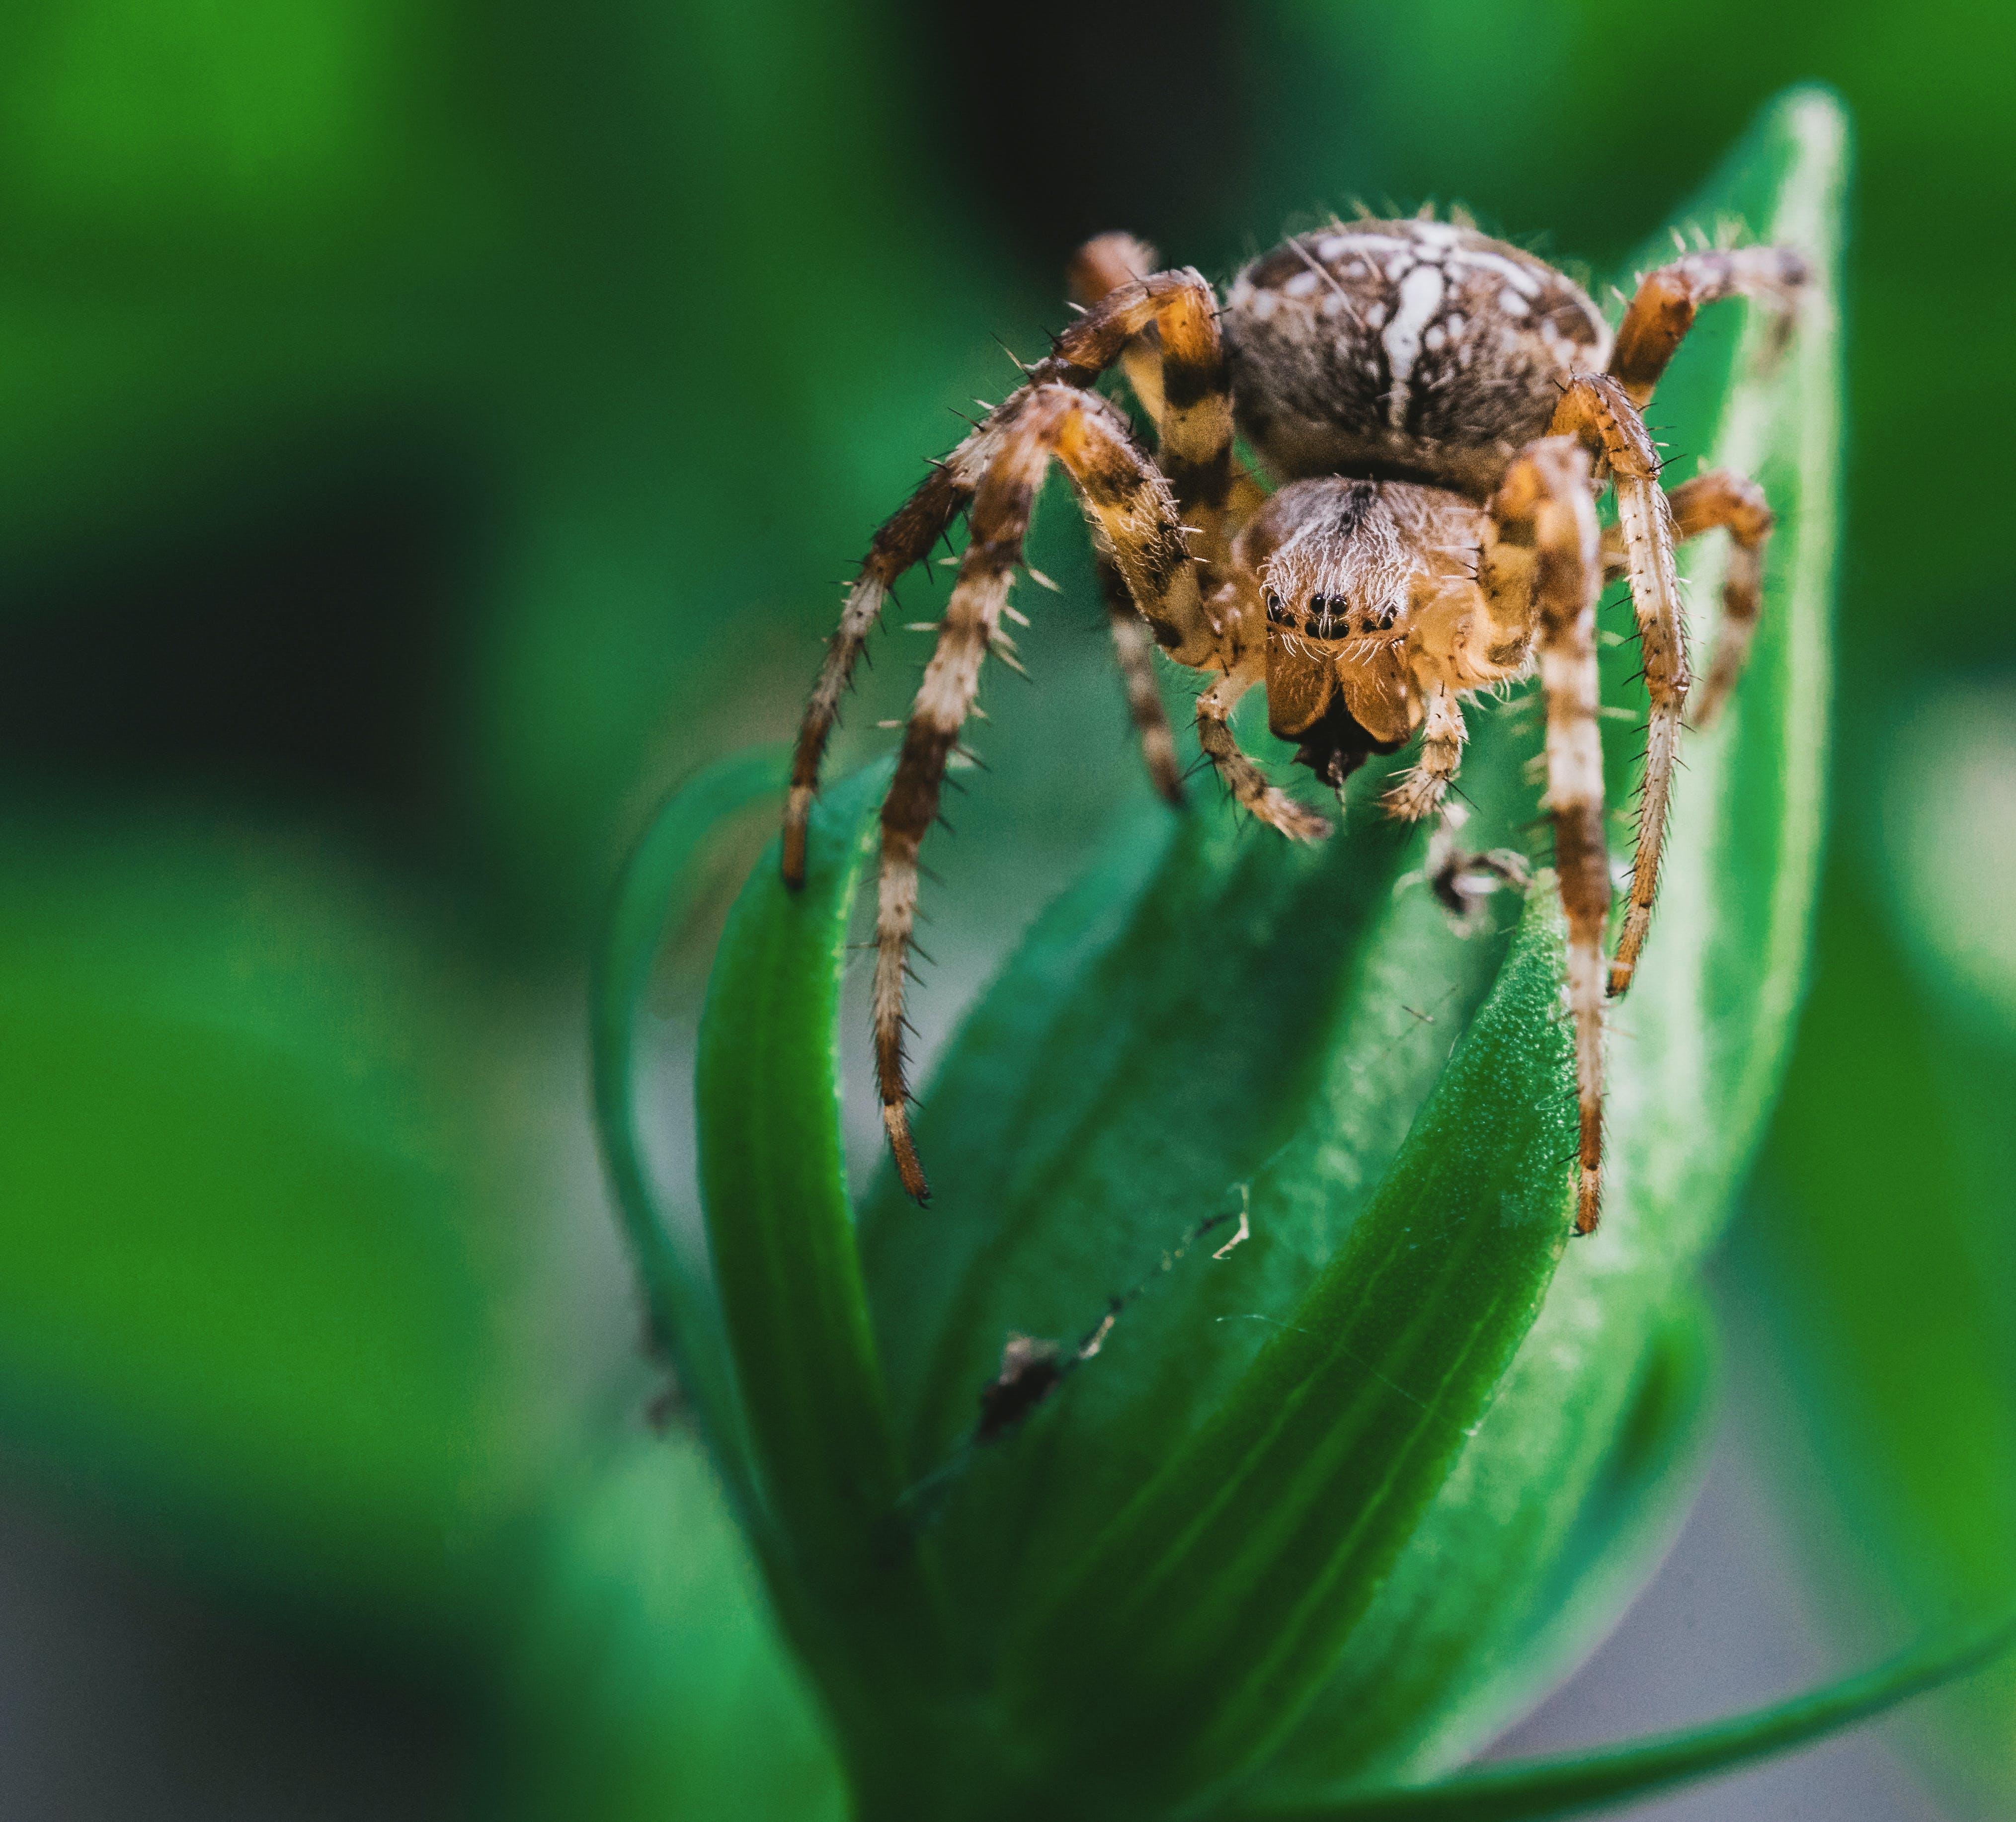 arachnid, close-up, creepy